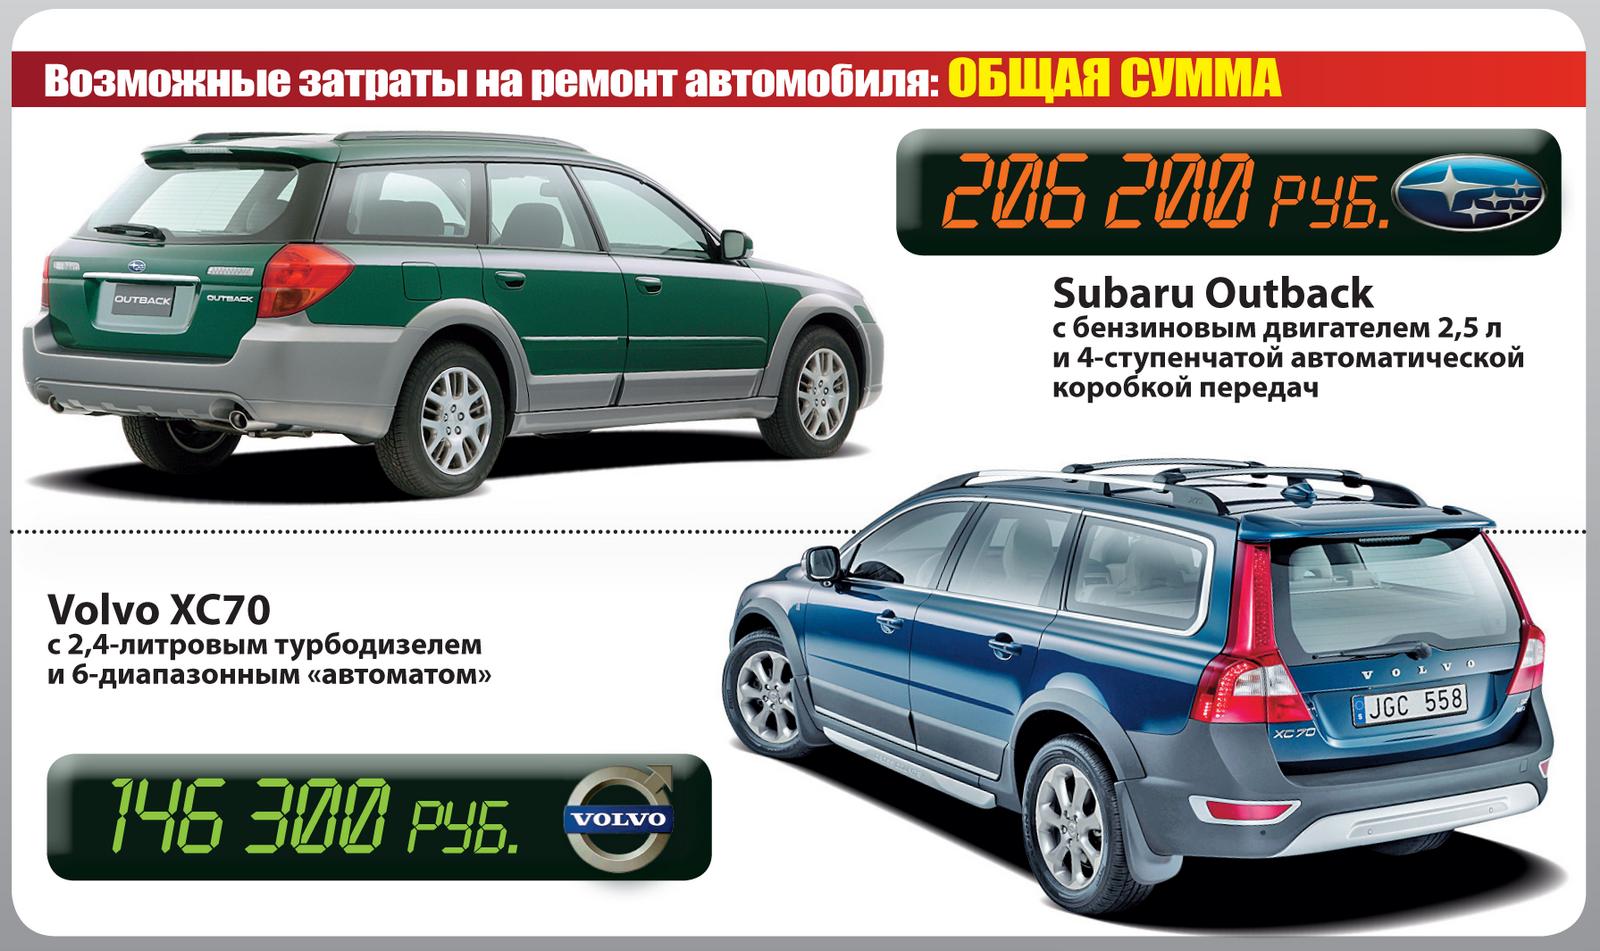 Subaru Outback иVolvo XC70